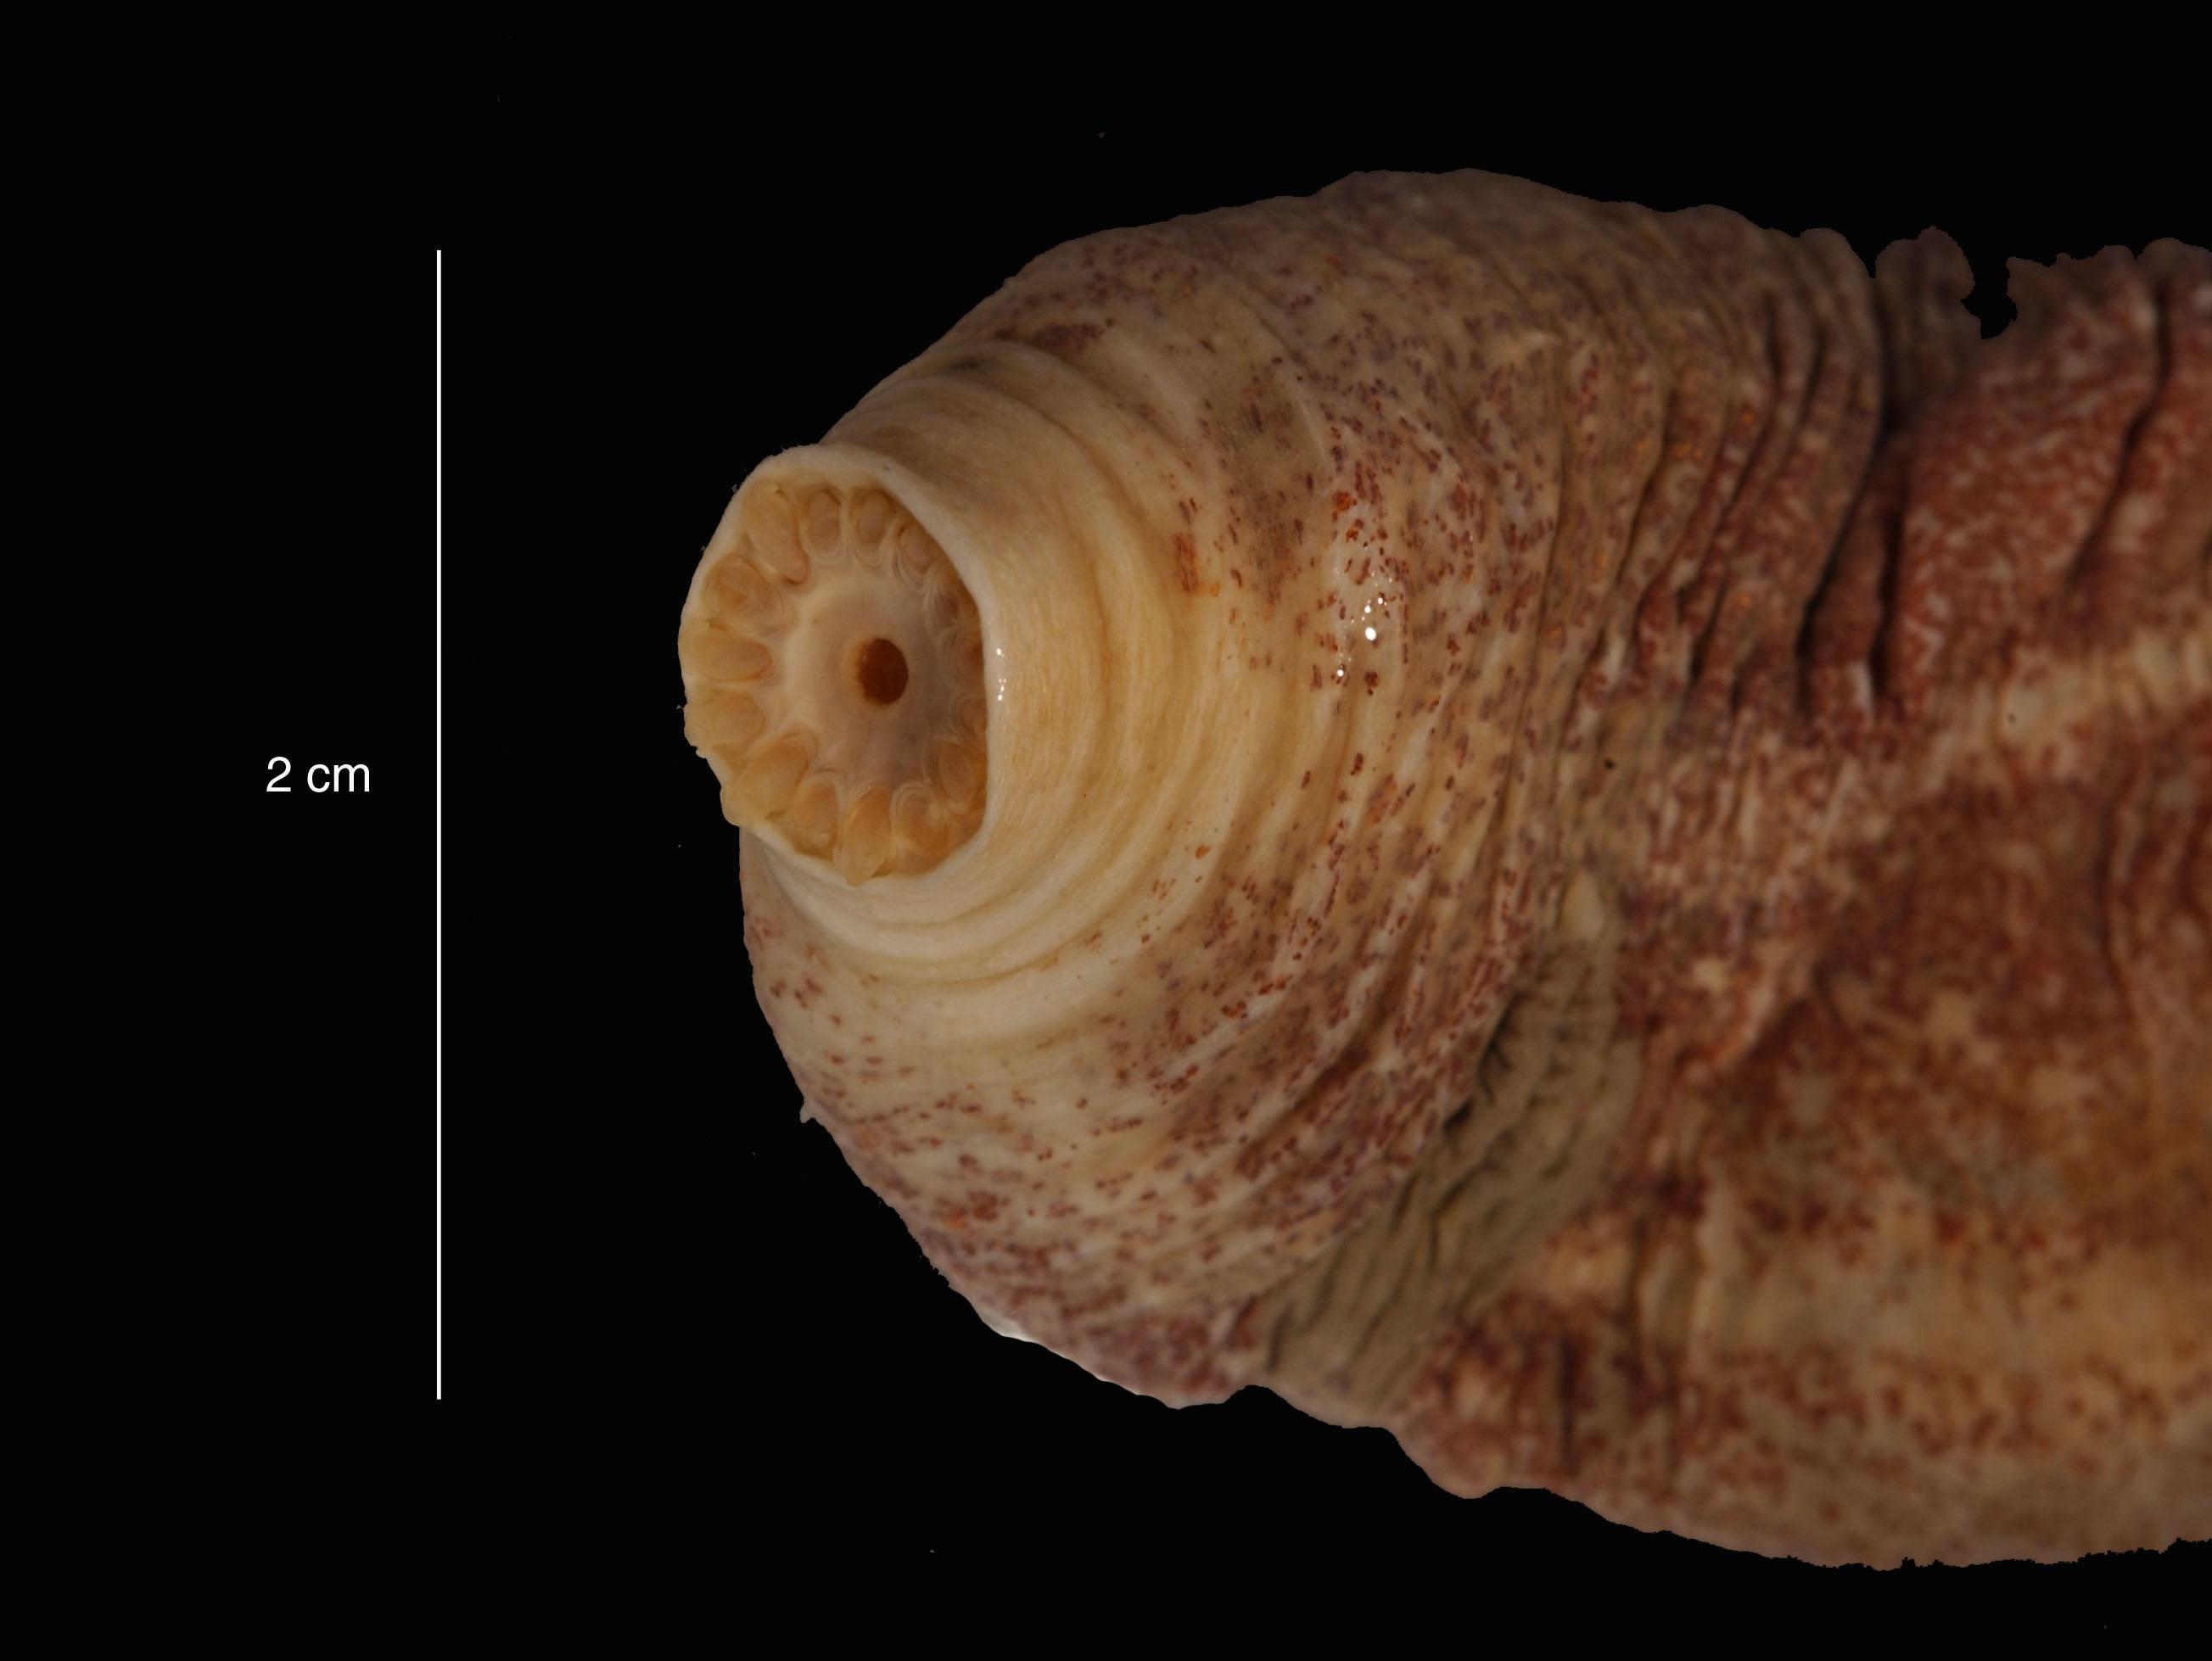 Image of muscular fusiform sea cucumber